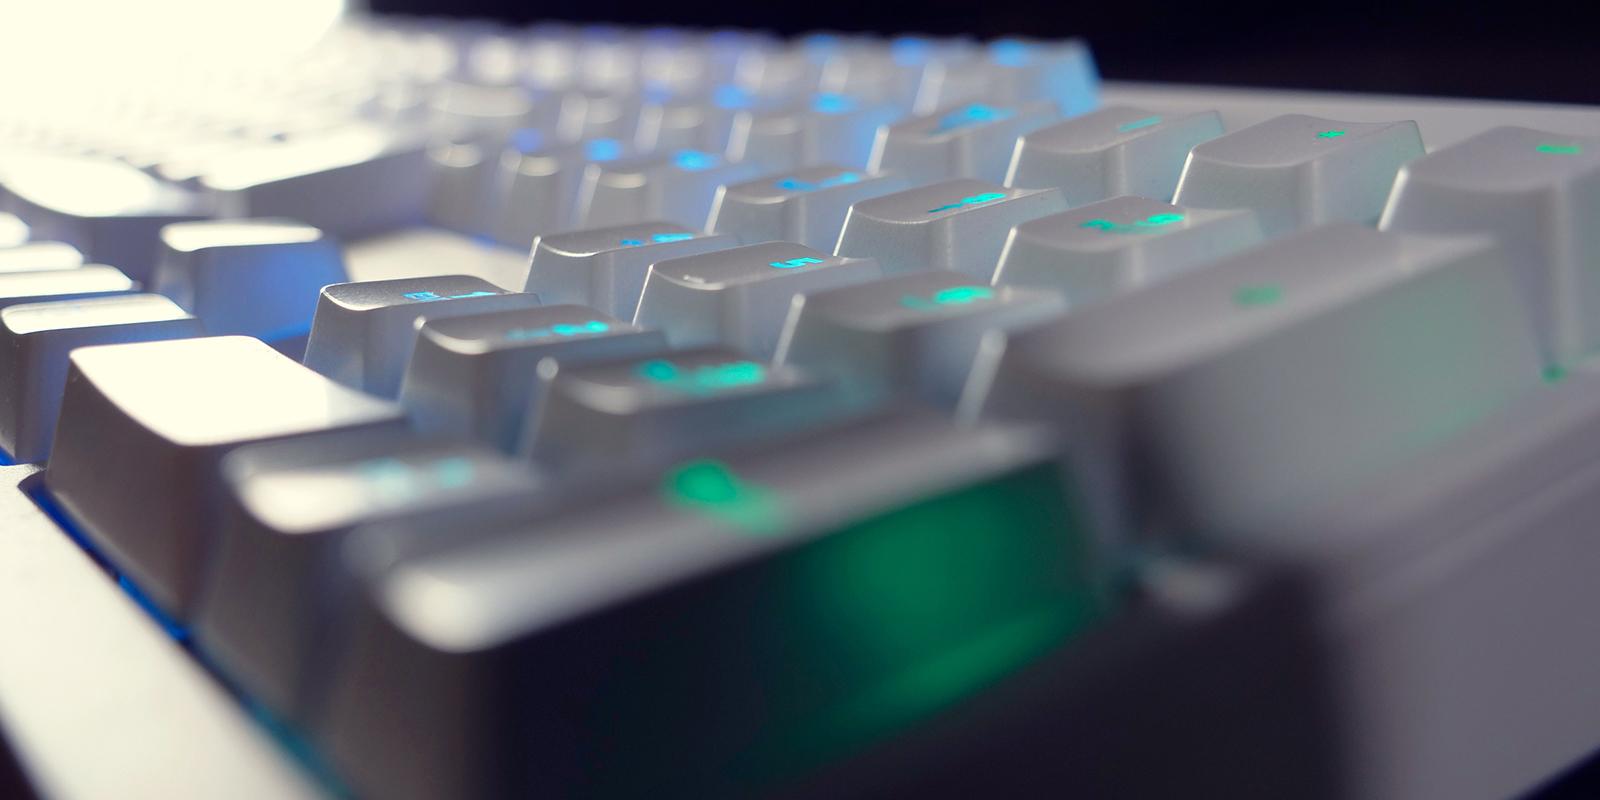 2-RGBホワイト 英語配列 赤軸メカニカル ゲーミングキーボード 1,680万色LEDイルミネーション(各キー設定可) UK配列4